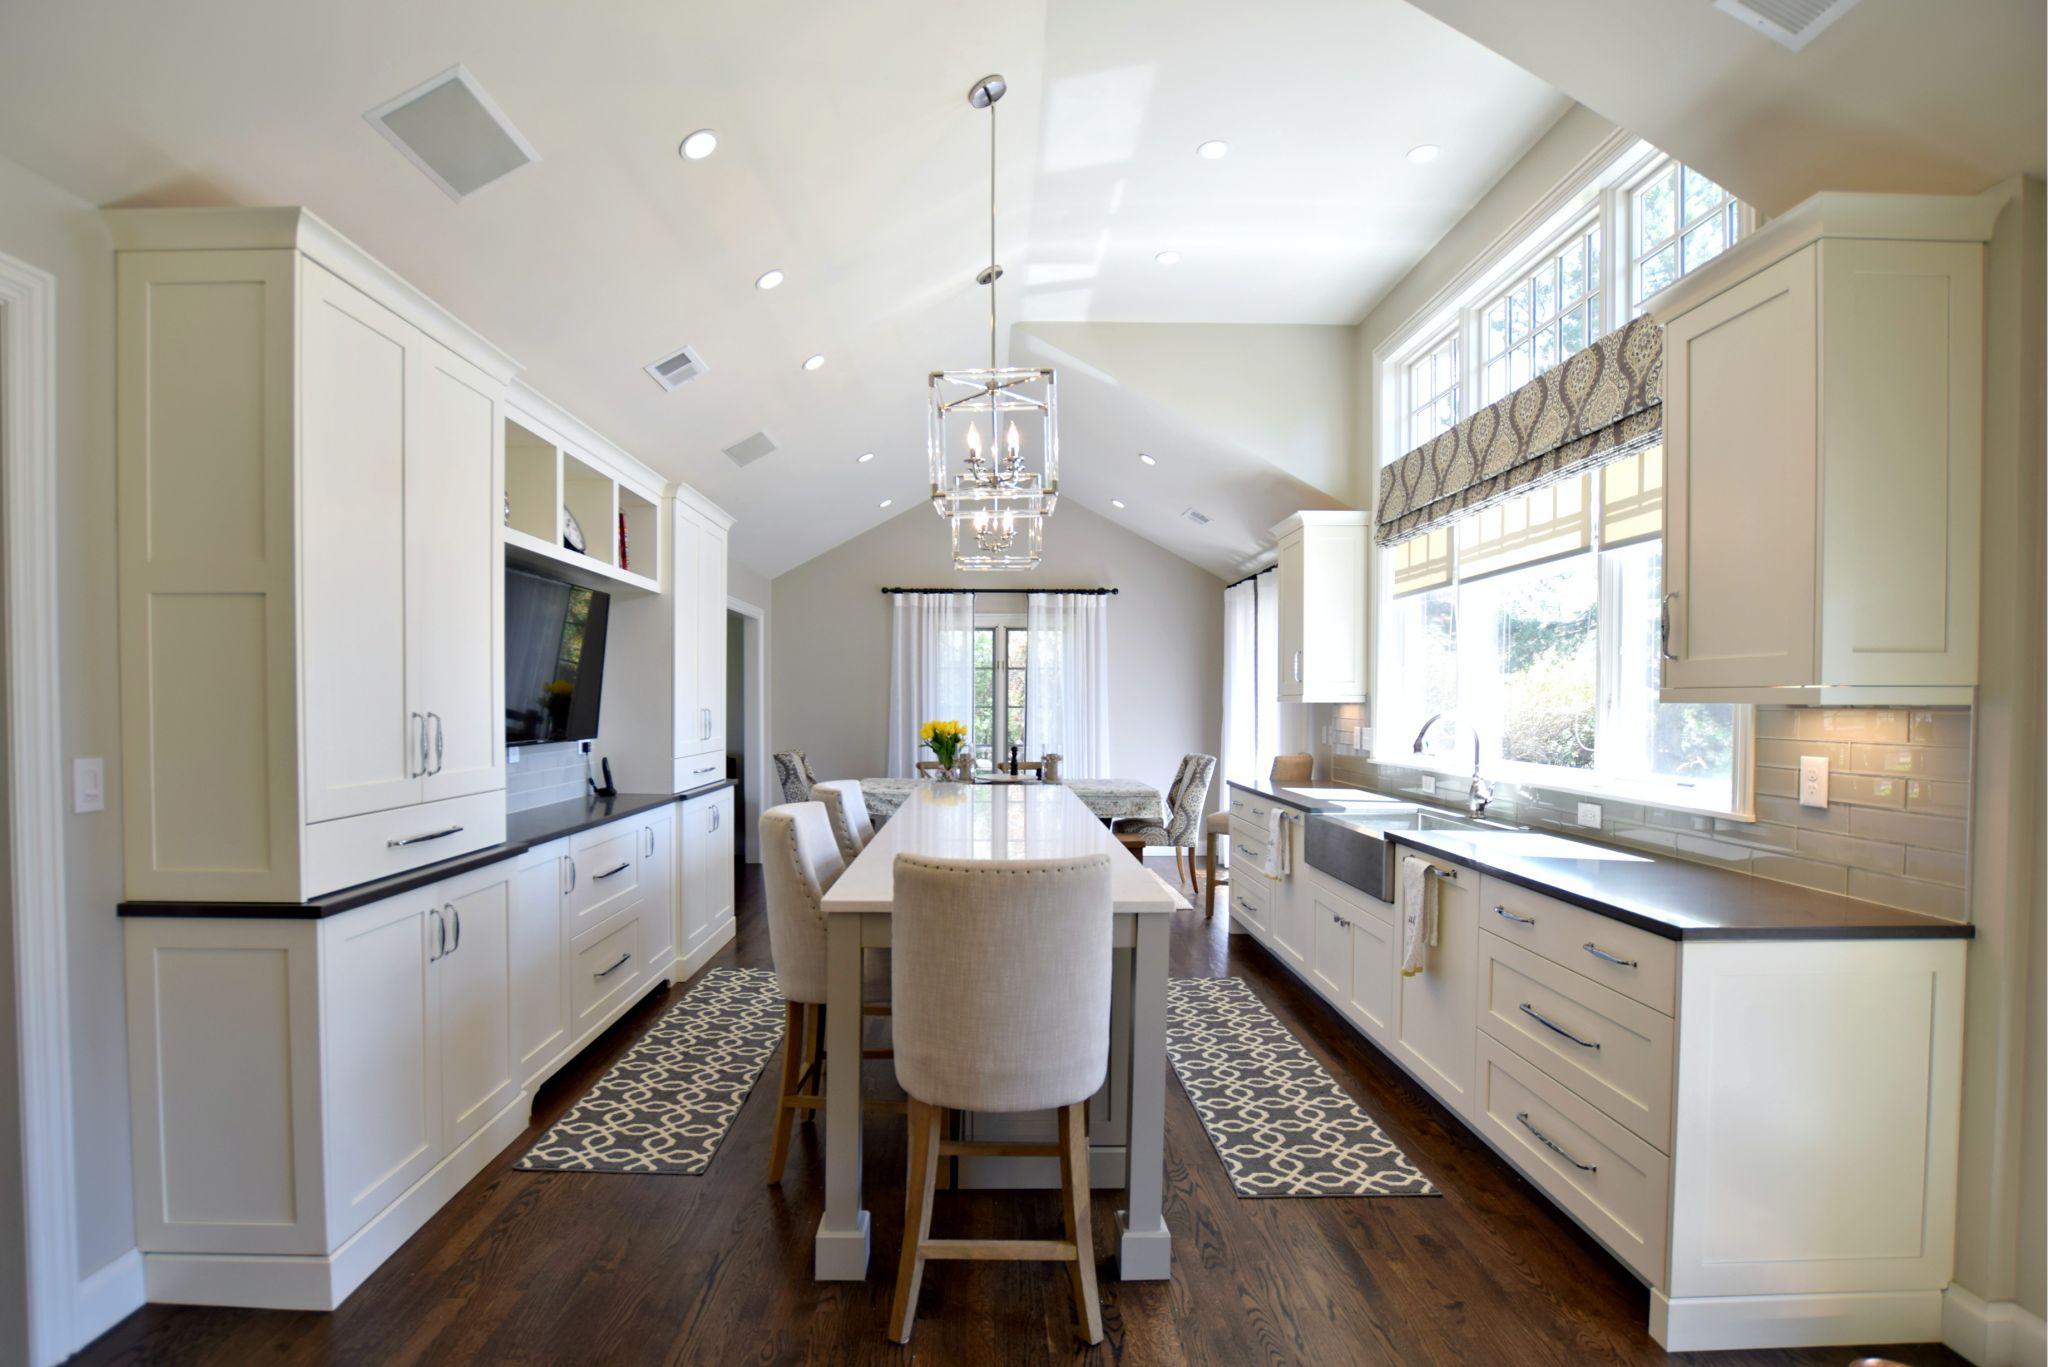 Denver Kitchens using Medallion kitchen cabinets